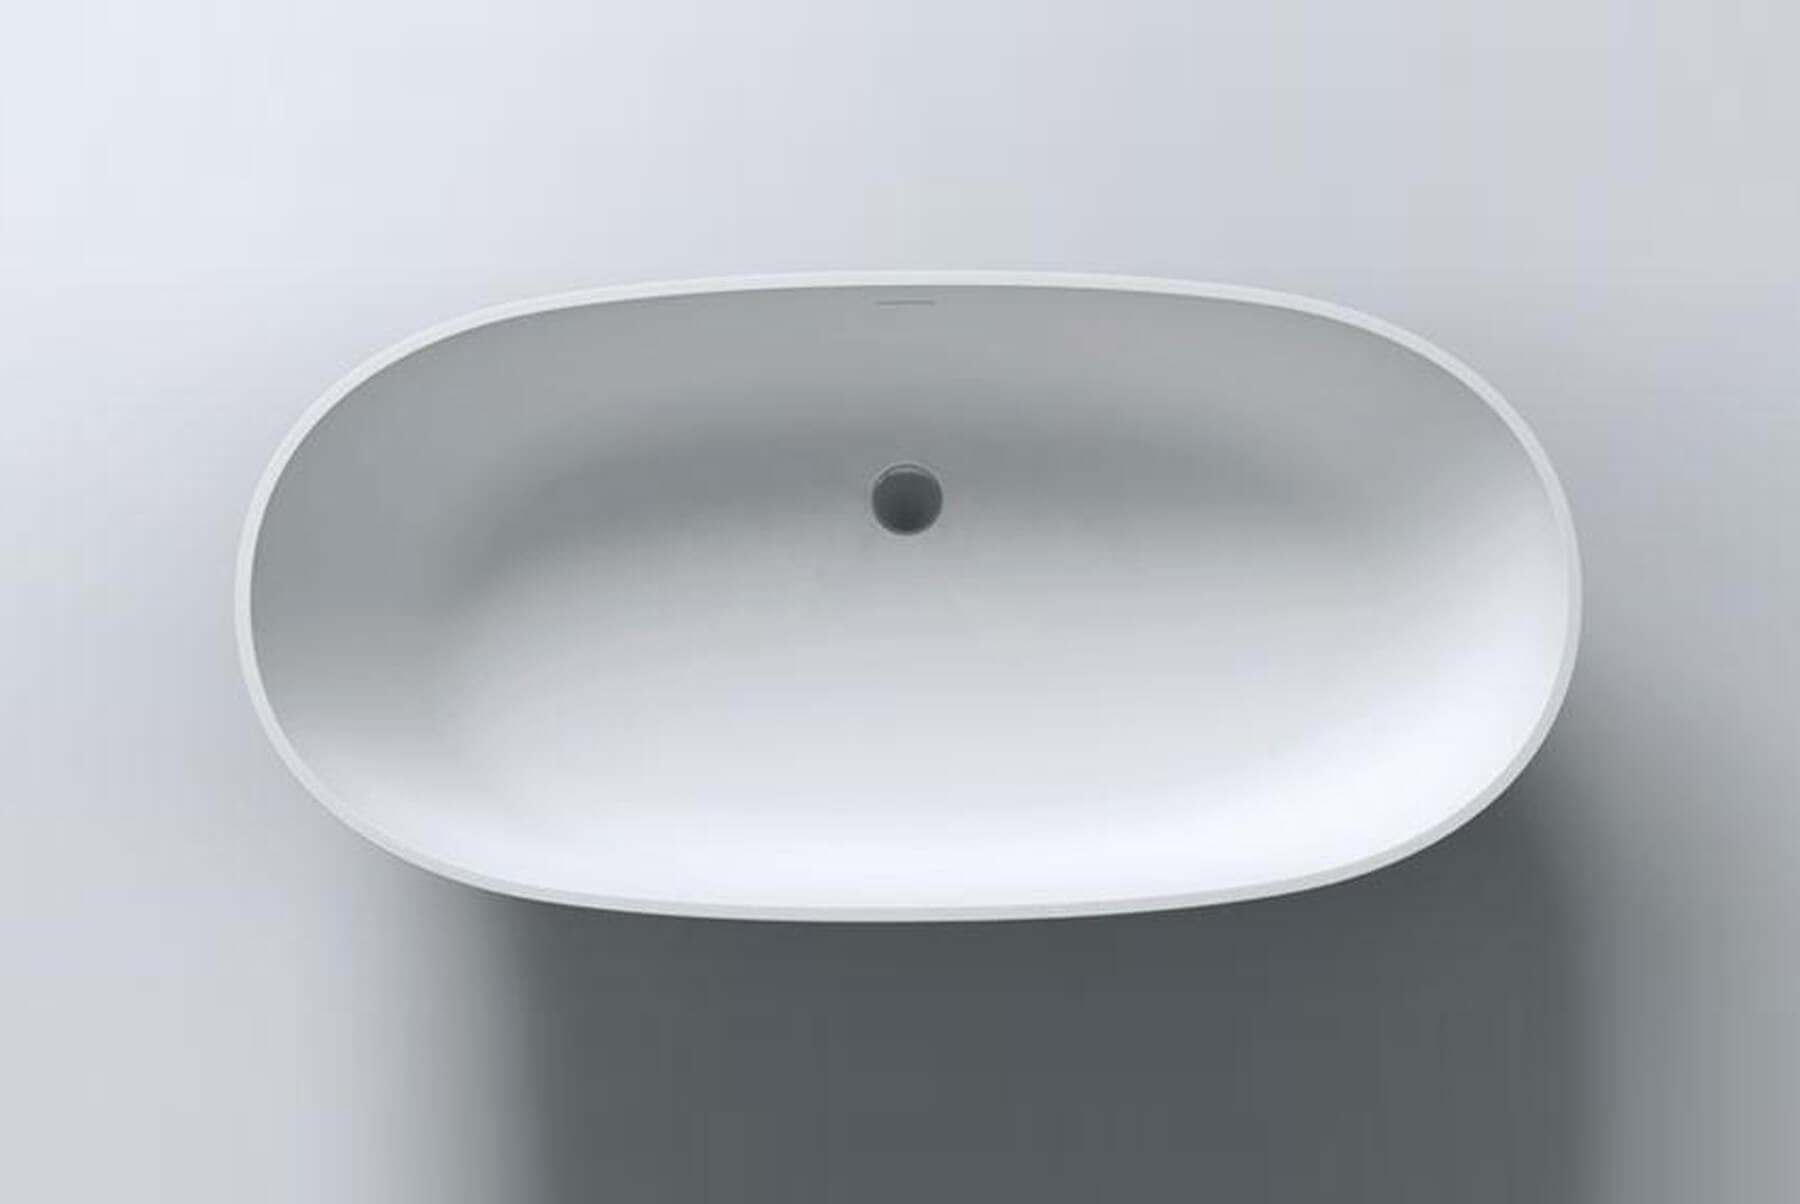 Bath-Tubs-WATERS-CLOUD-BATH-TUB-OVERHEAD-1800x1204